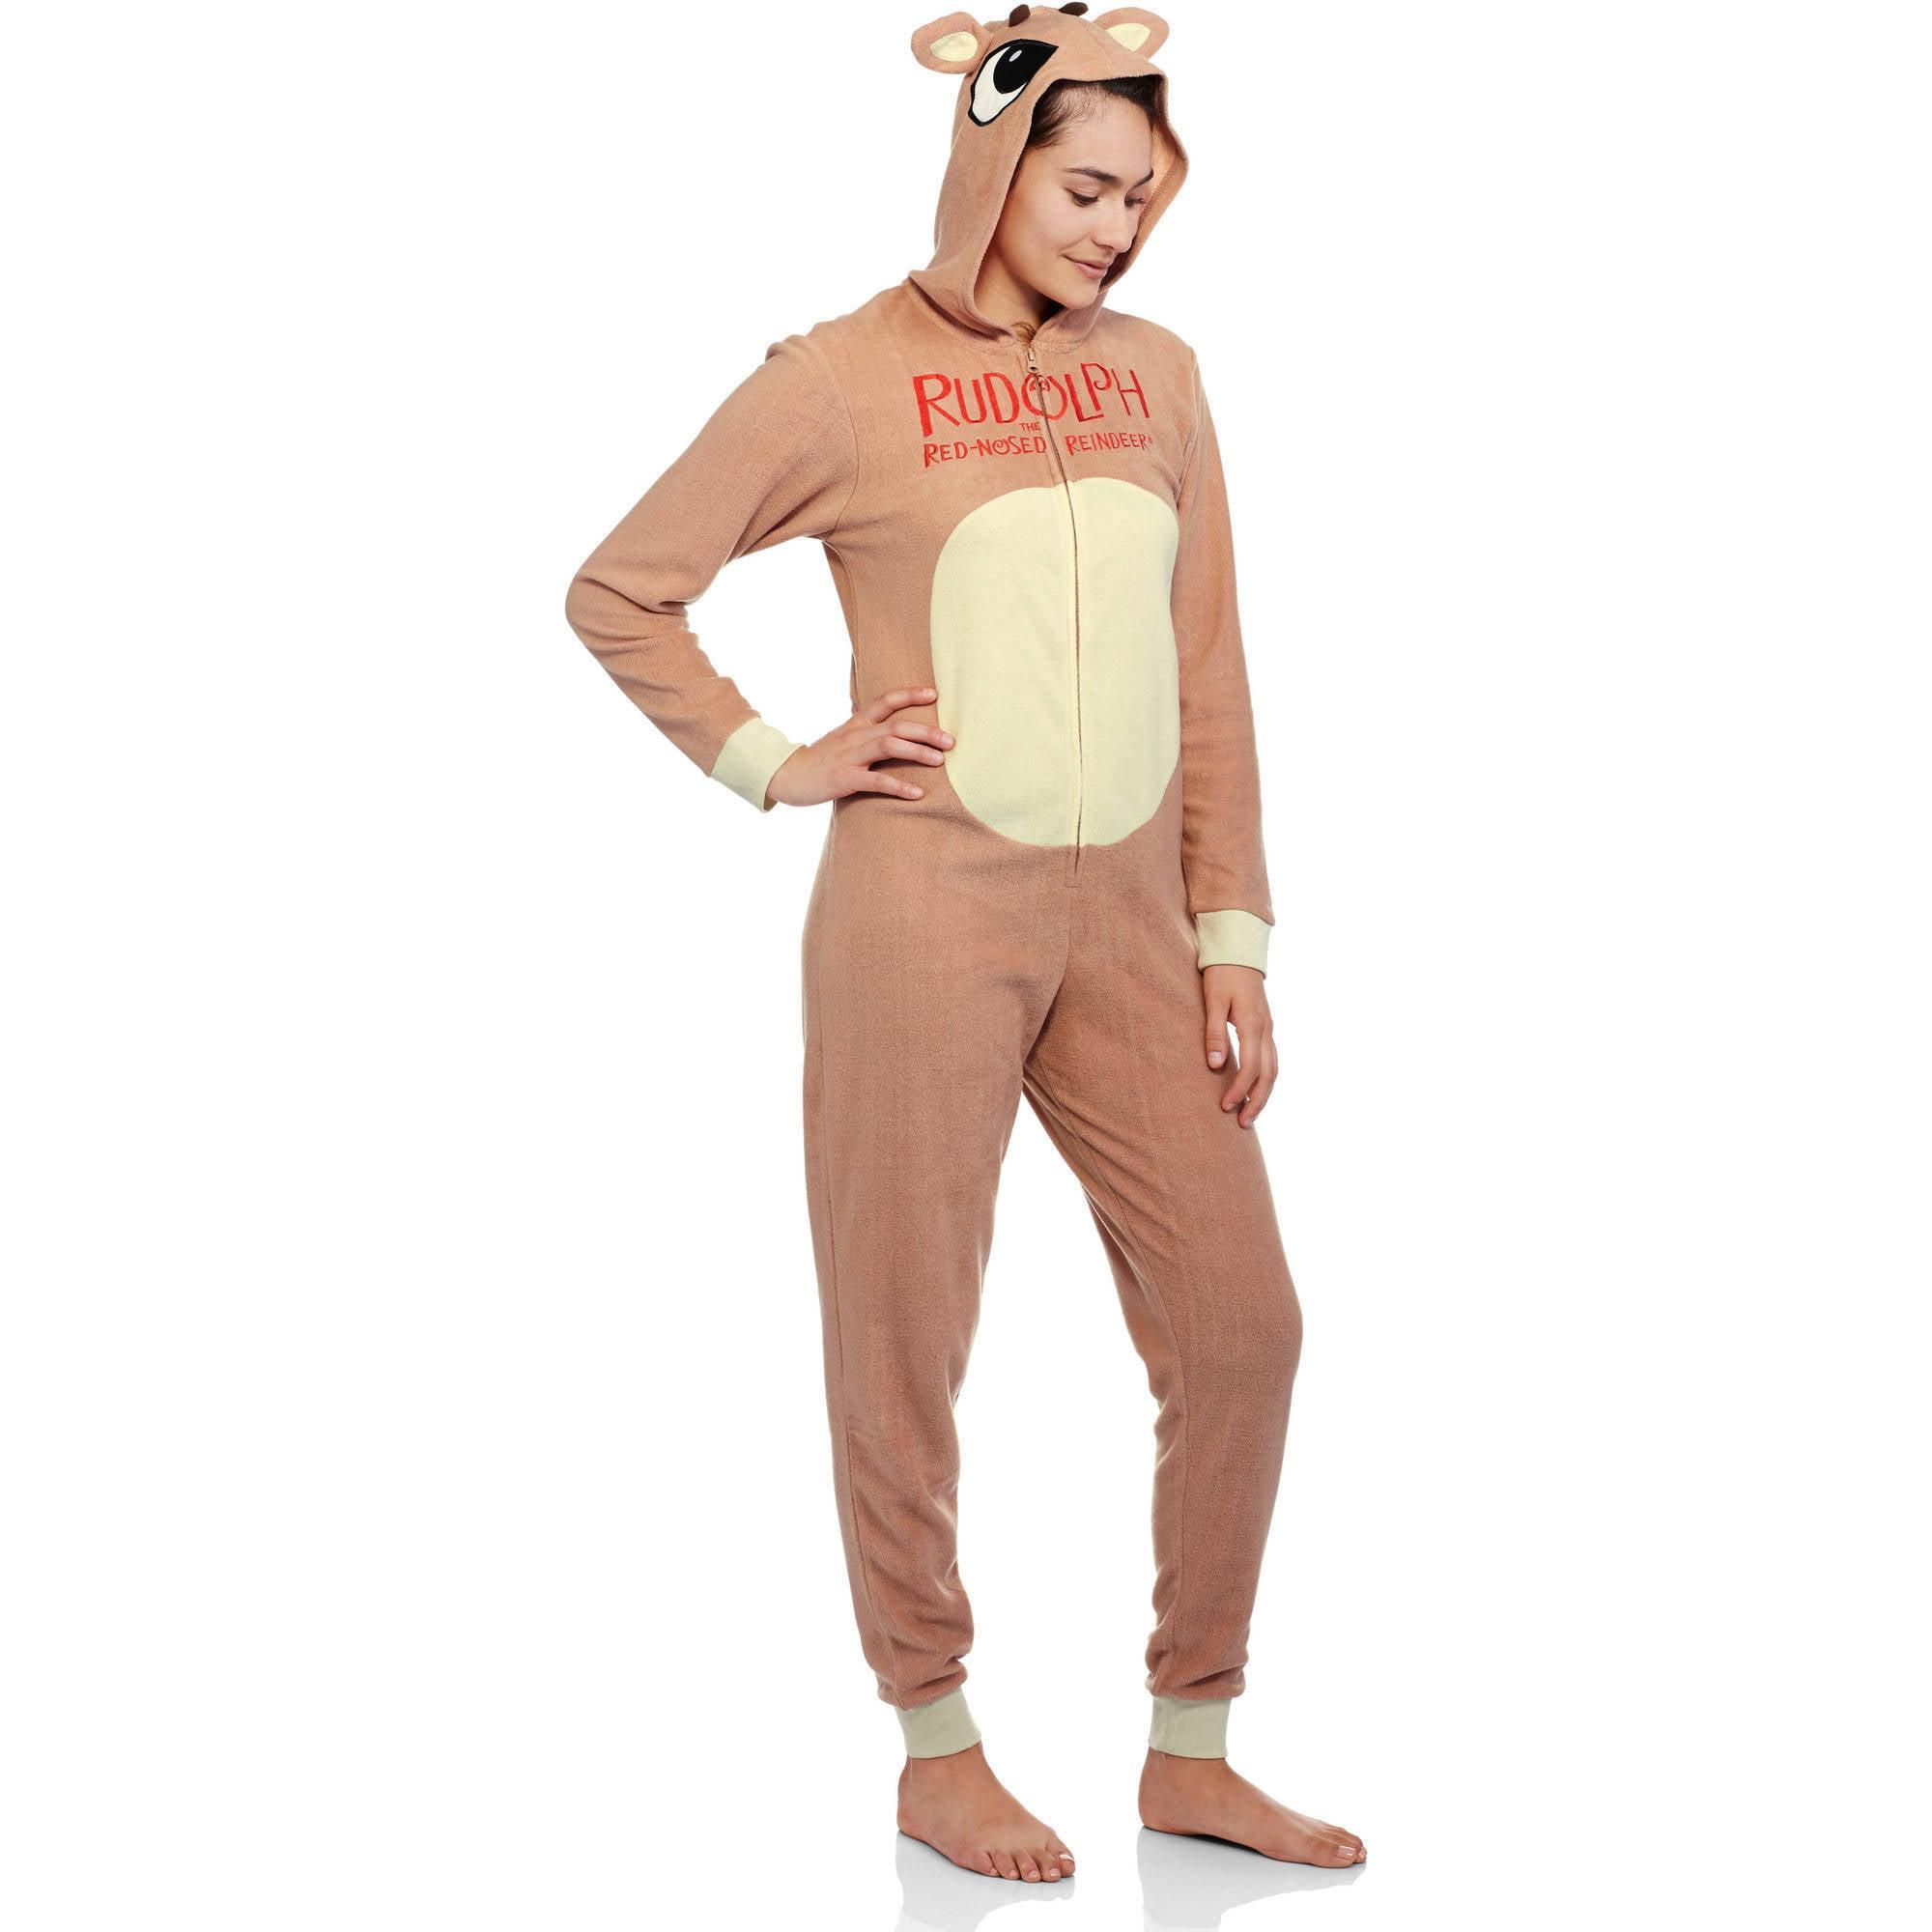 a98a86d9ecf1 RUDOLPH - Women s Sleepwear Adult Onesie Costume Union Suit Pajama -  Walmart.com